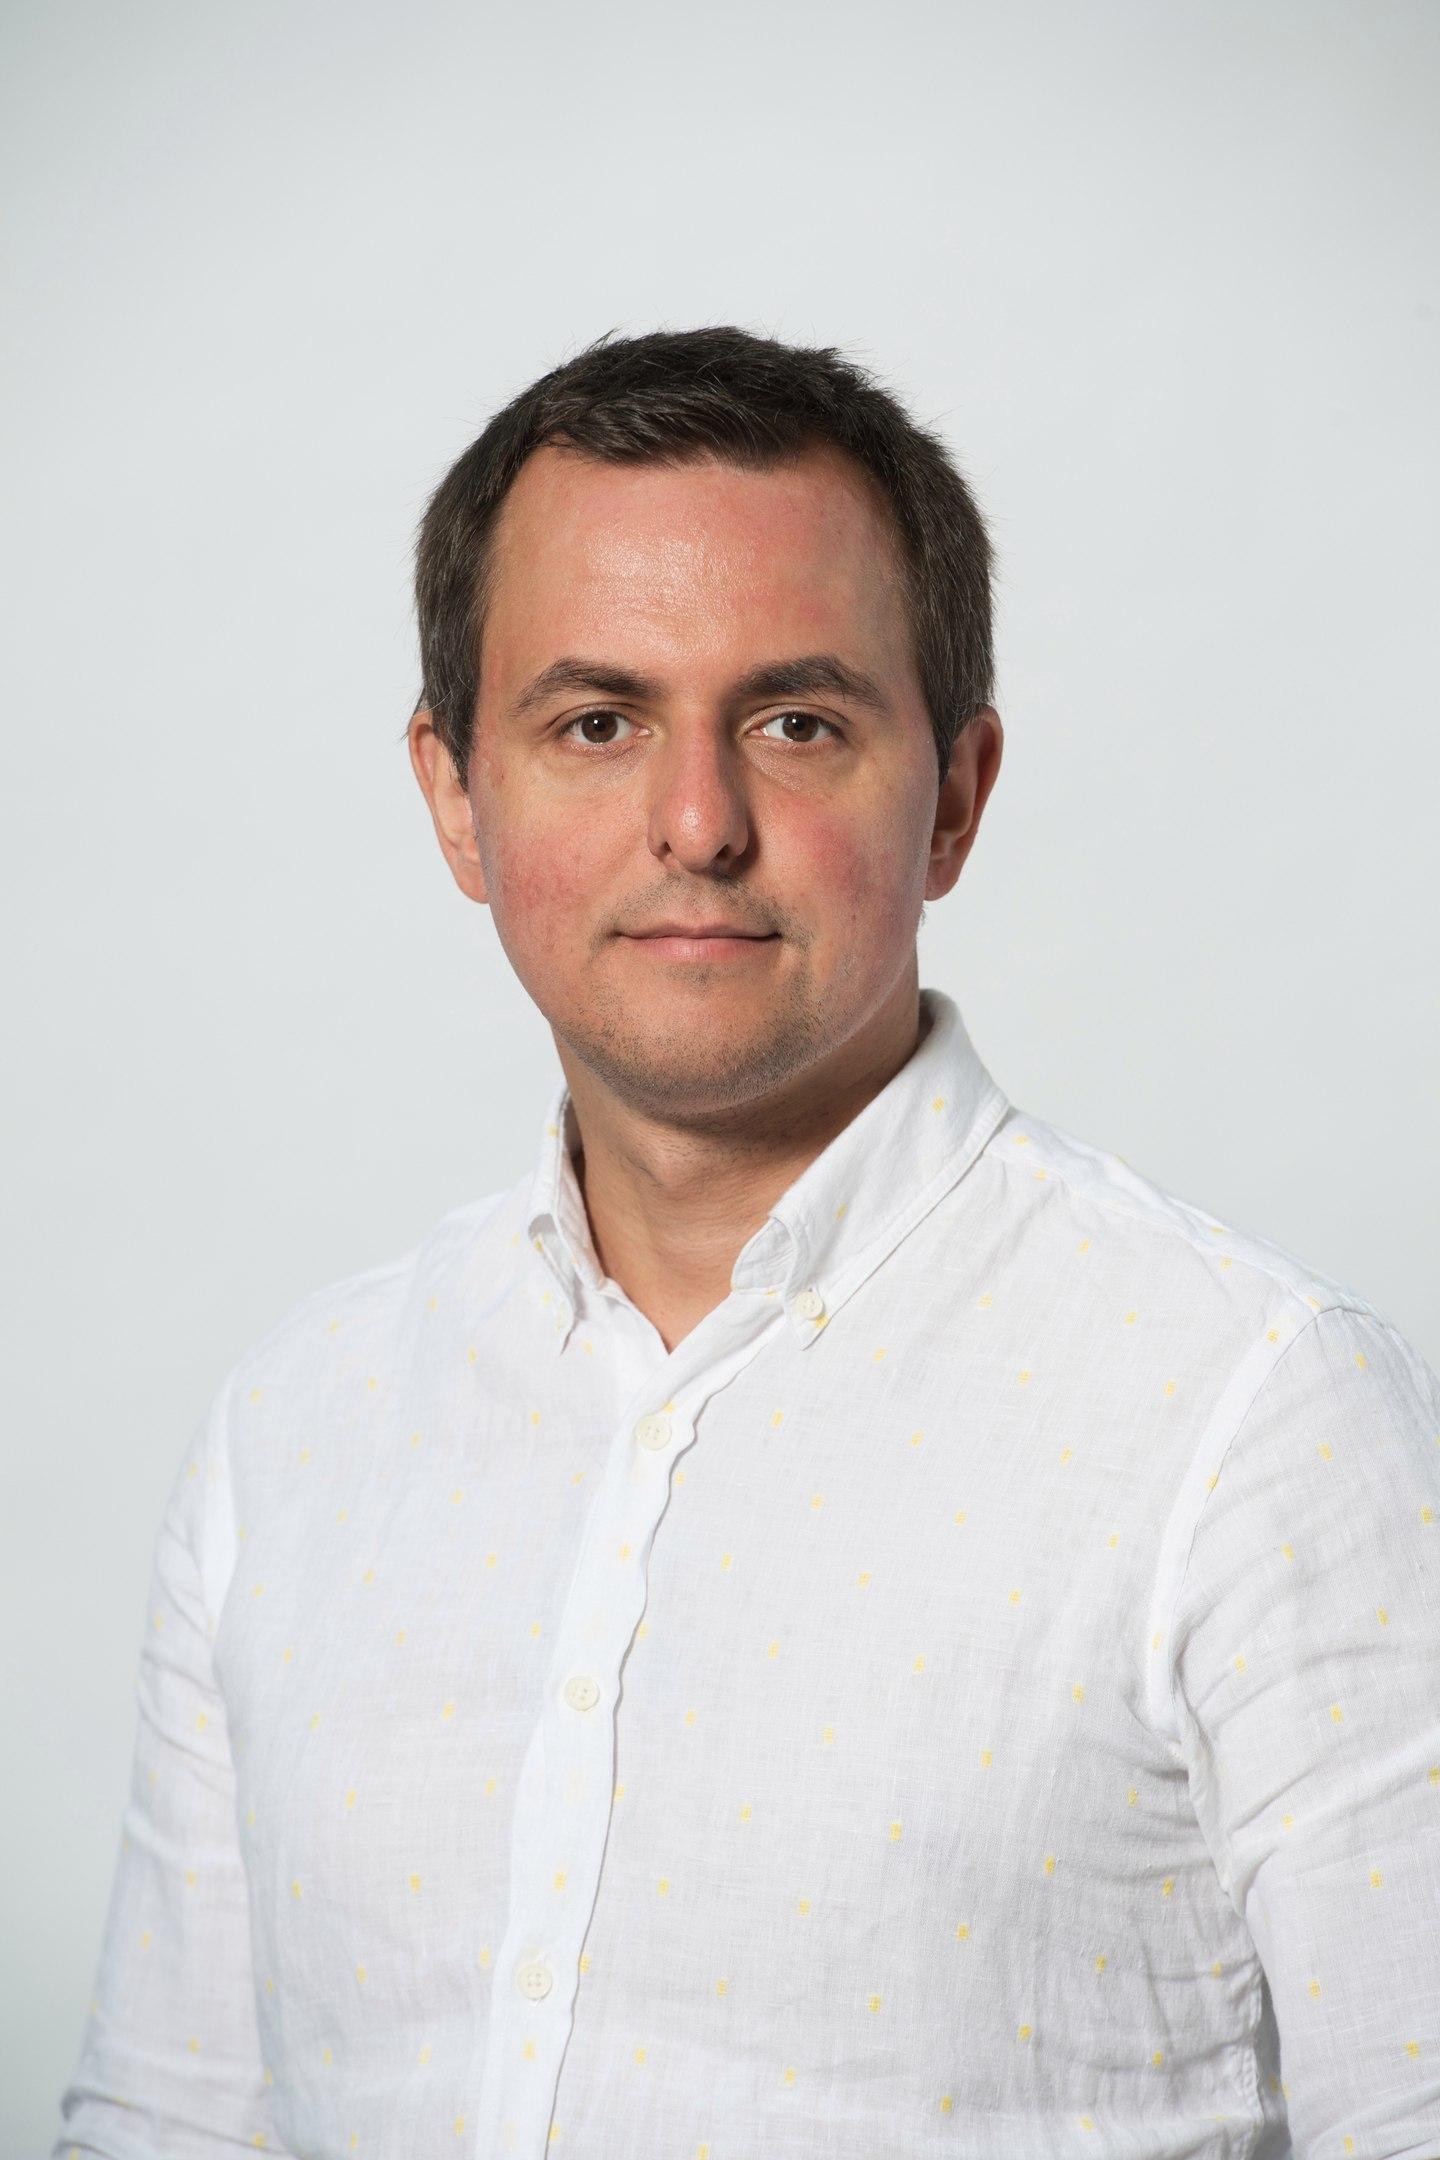 Максим Коротков, 35 лет, Bruxelles, Бельгия. Фото 2